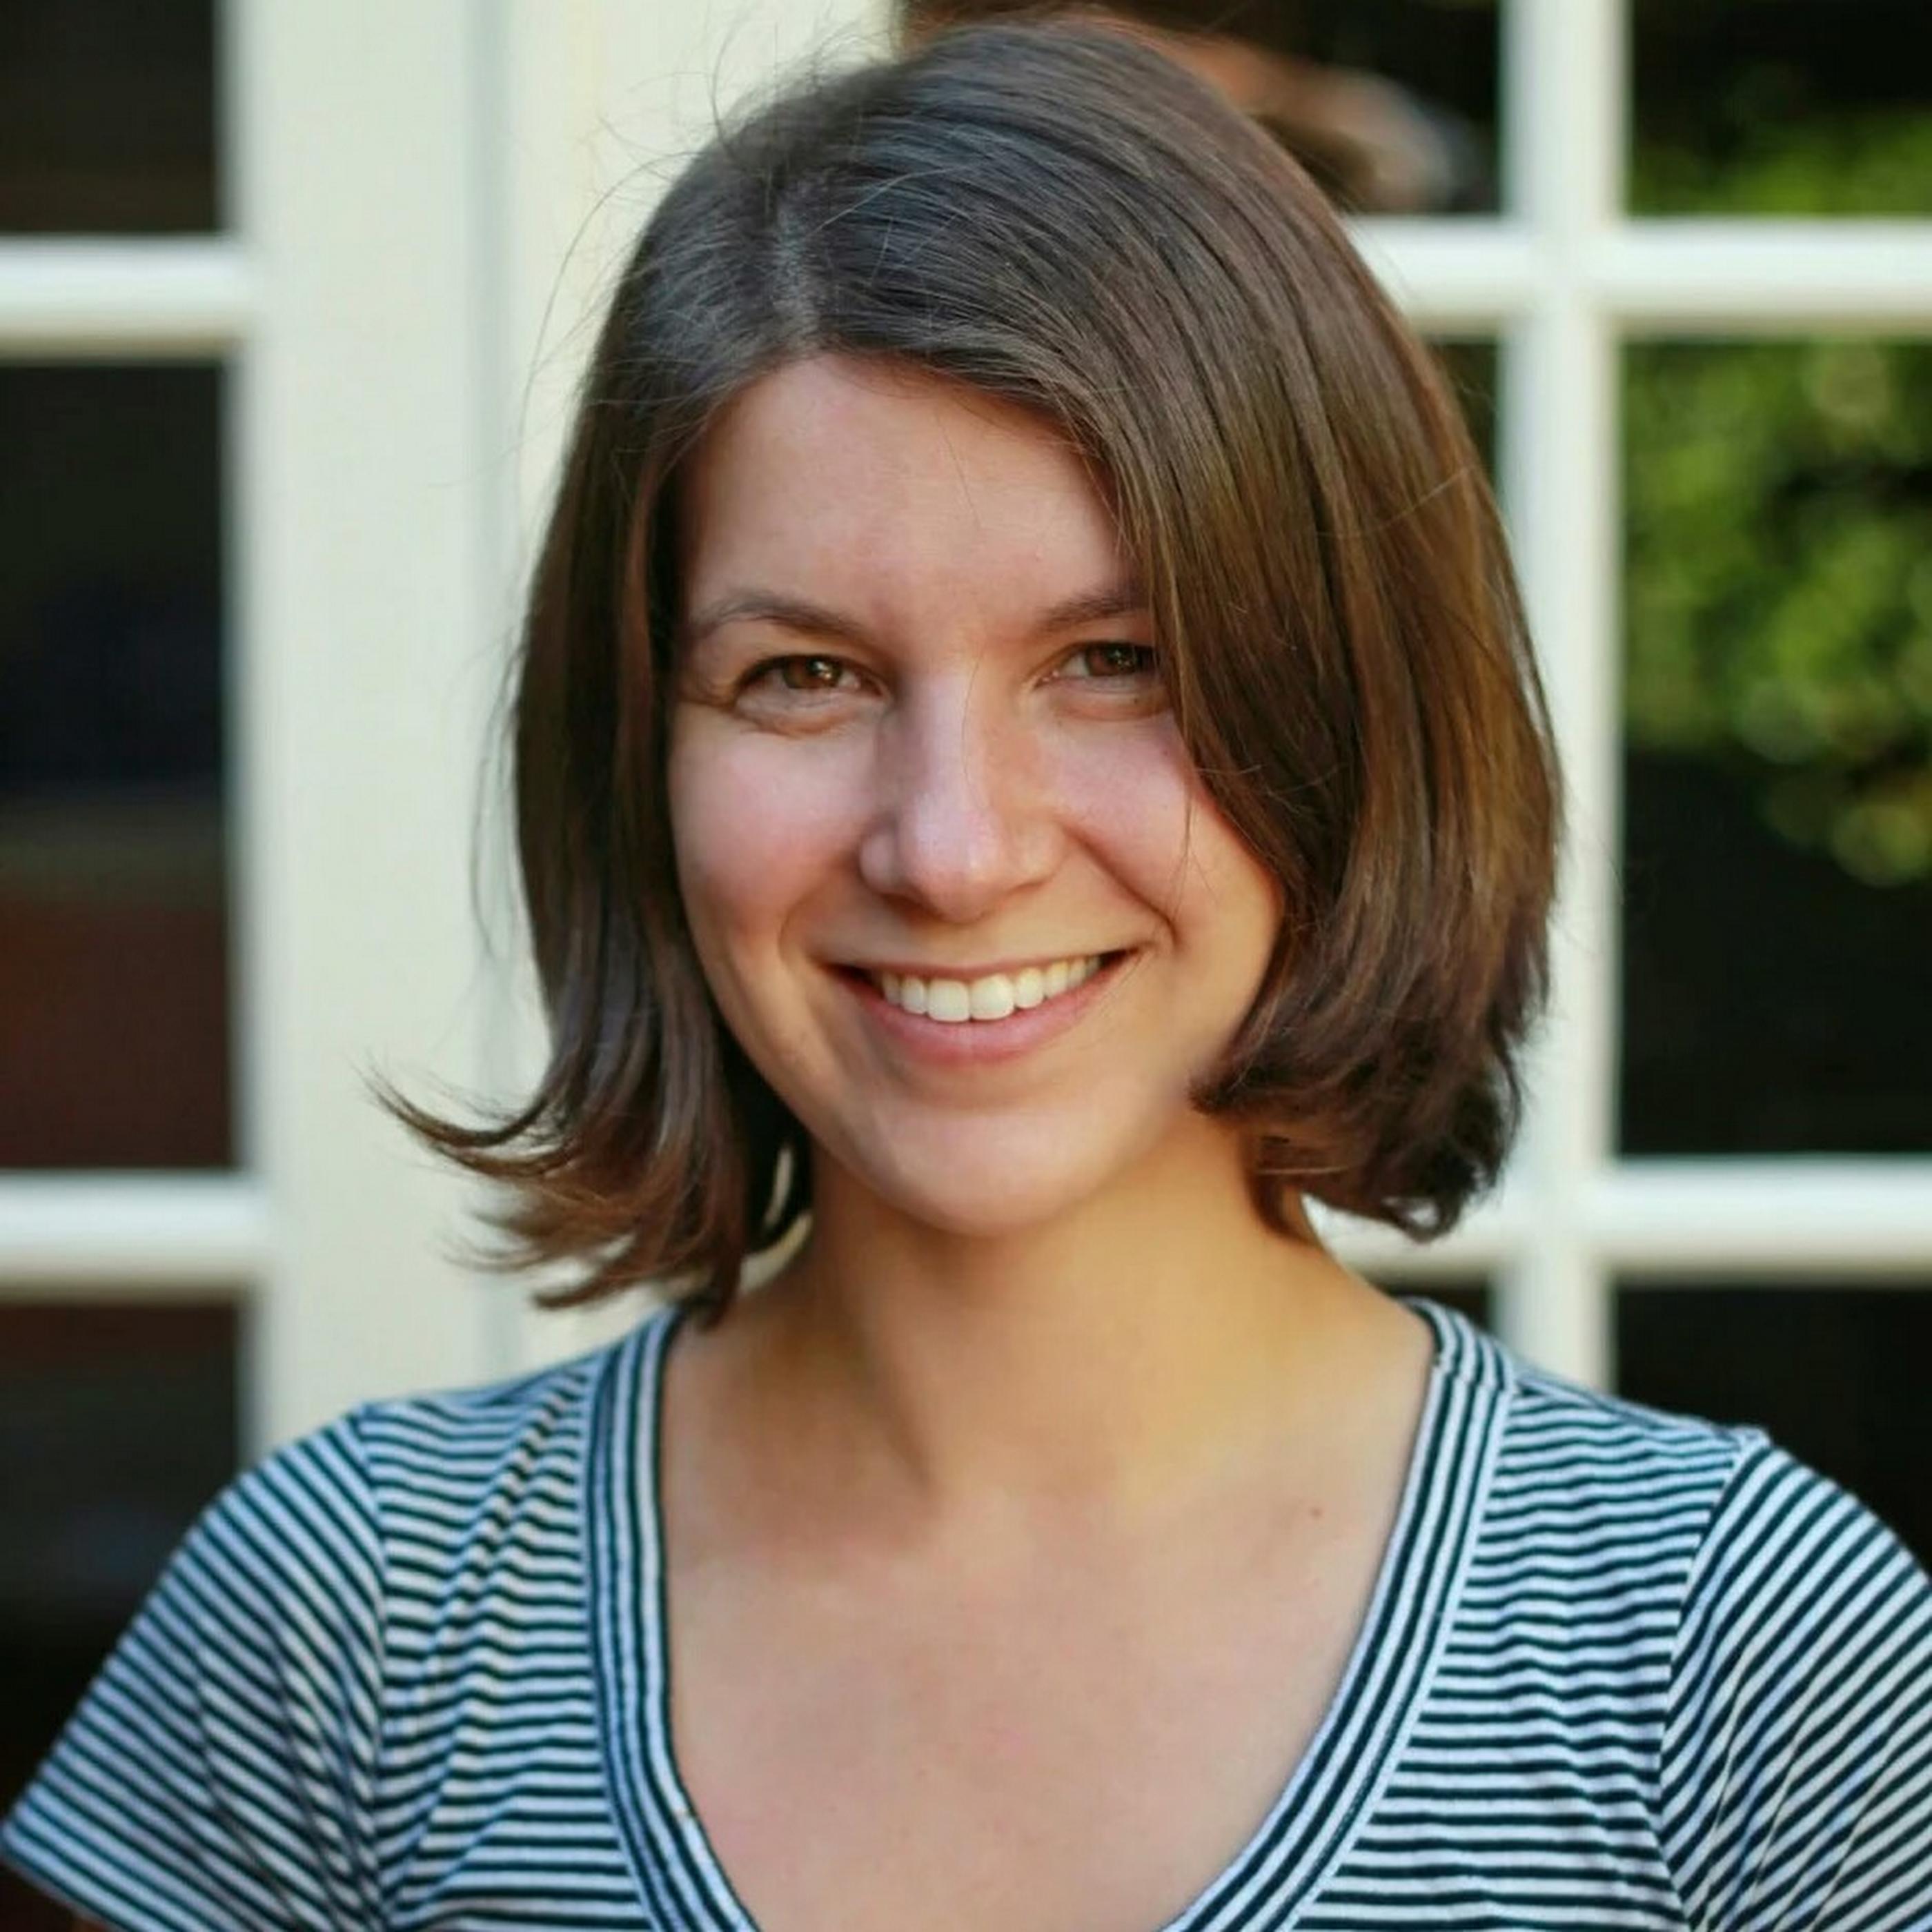 Danielle Buckley